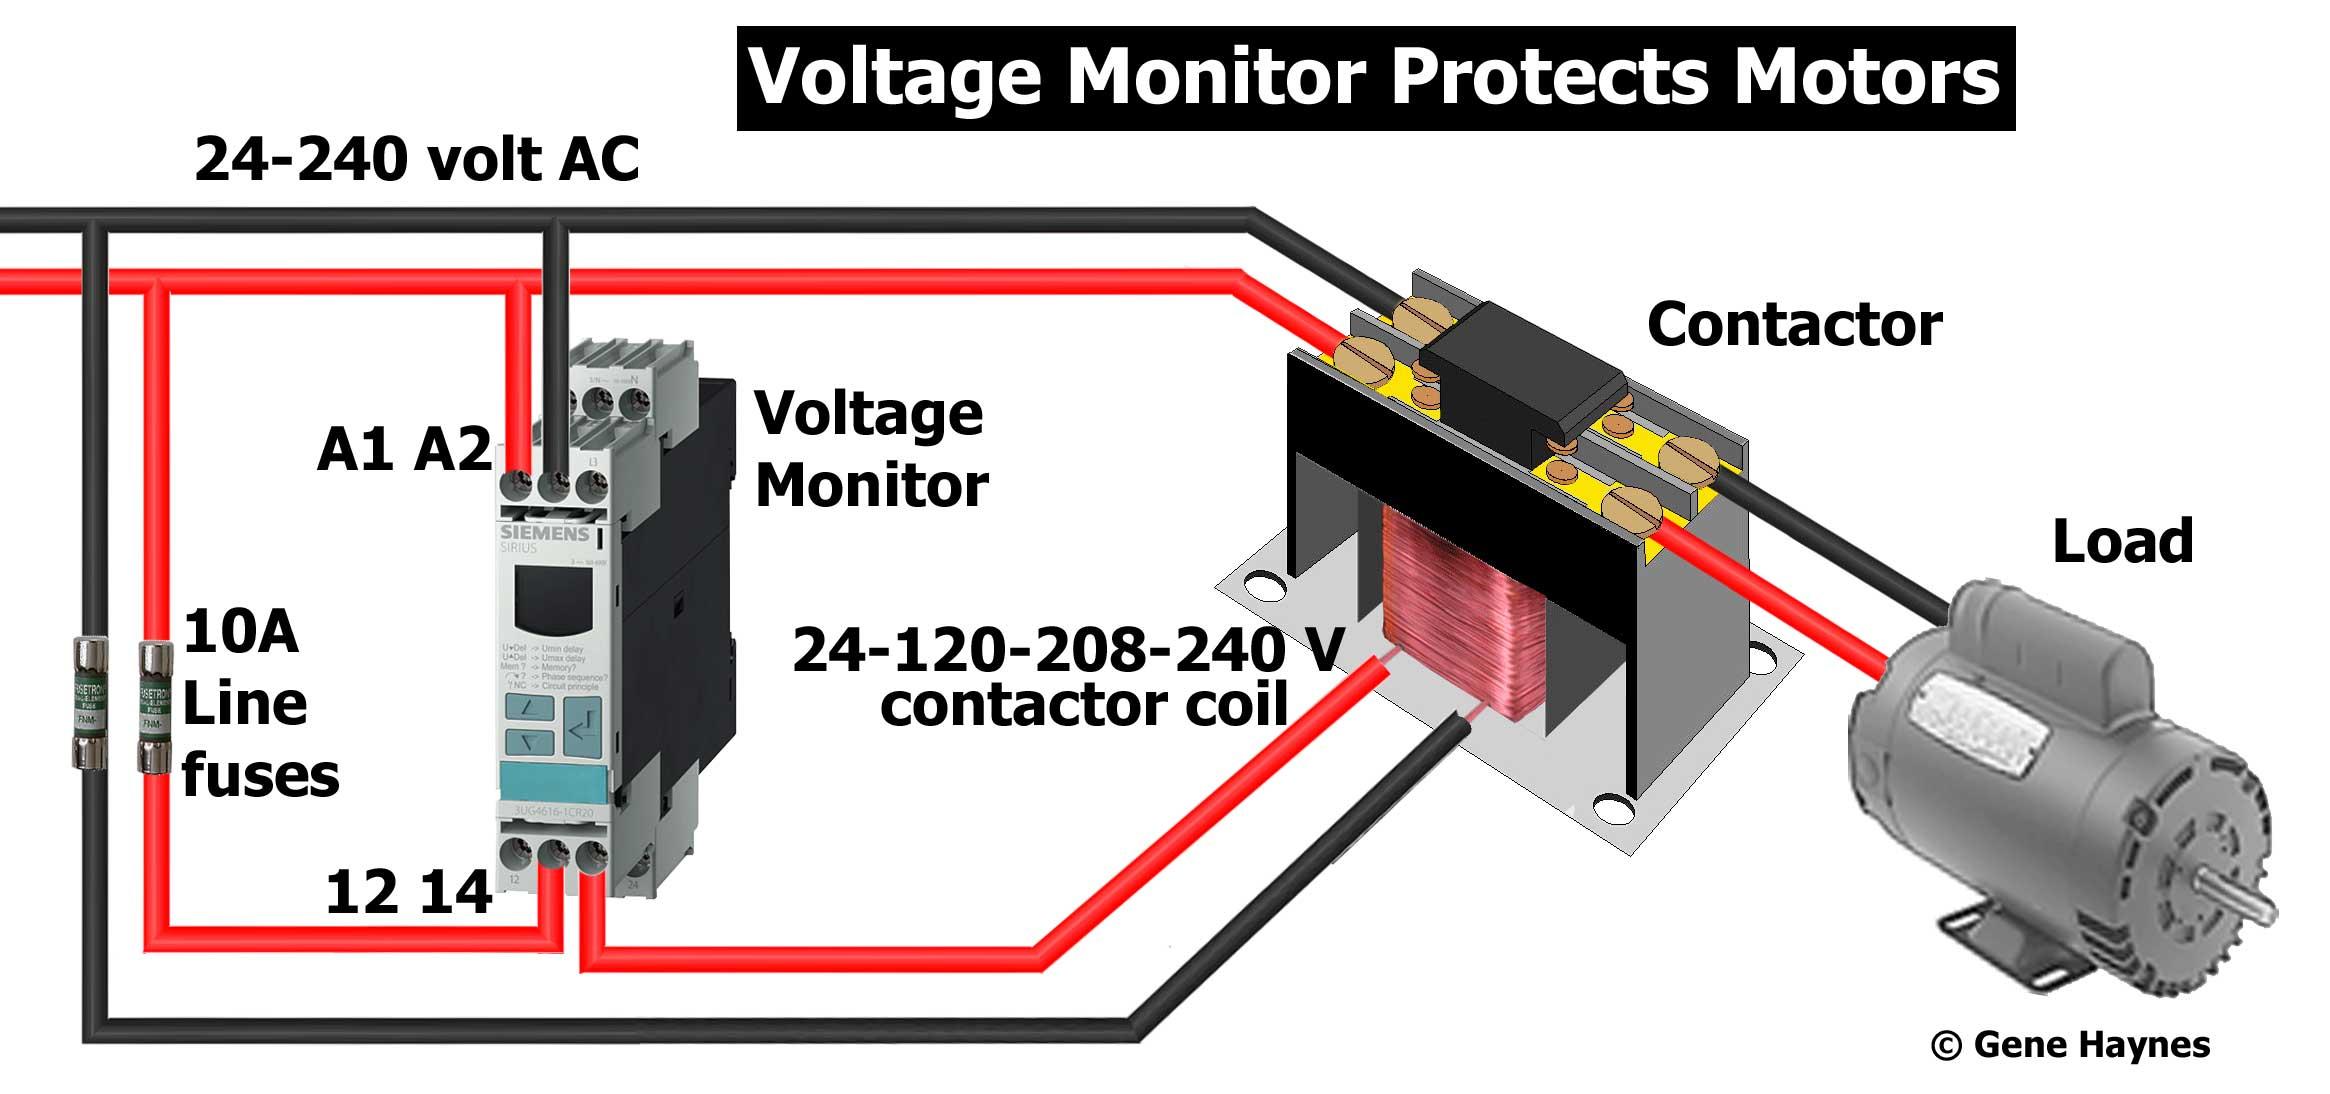 240 Volt Contactor Wiring Diagram | Wiring Diagram - 240 Volt Contactor Wiring Diagram